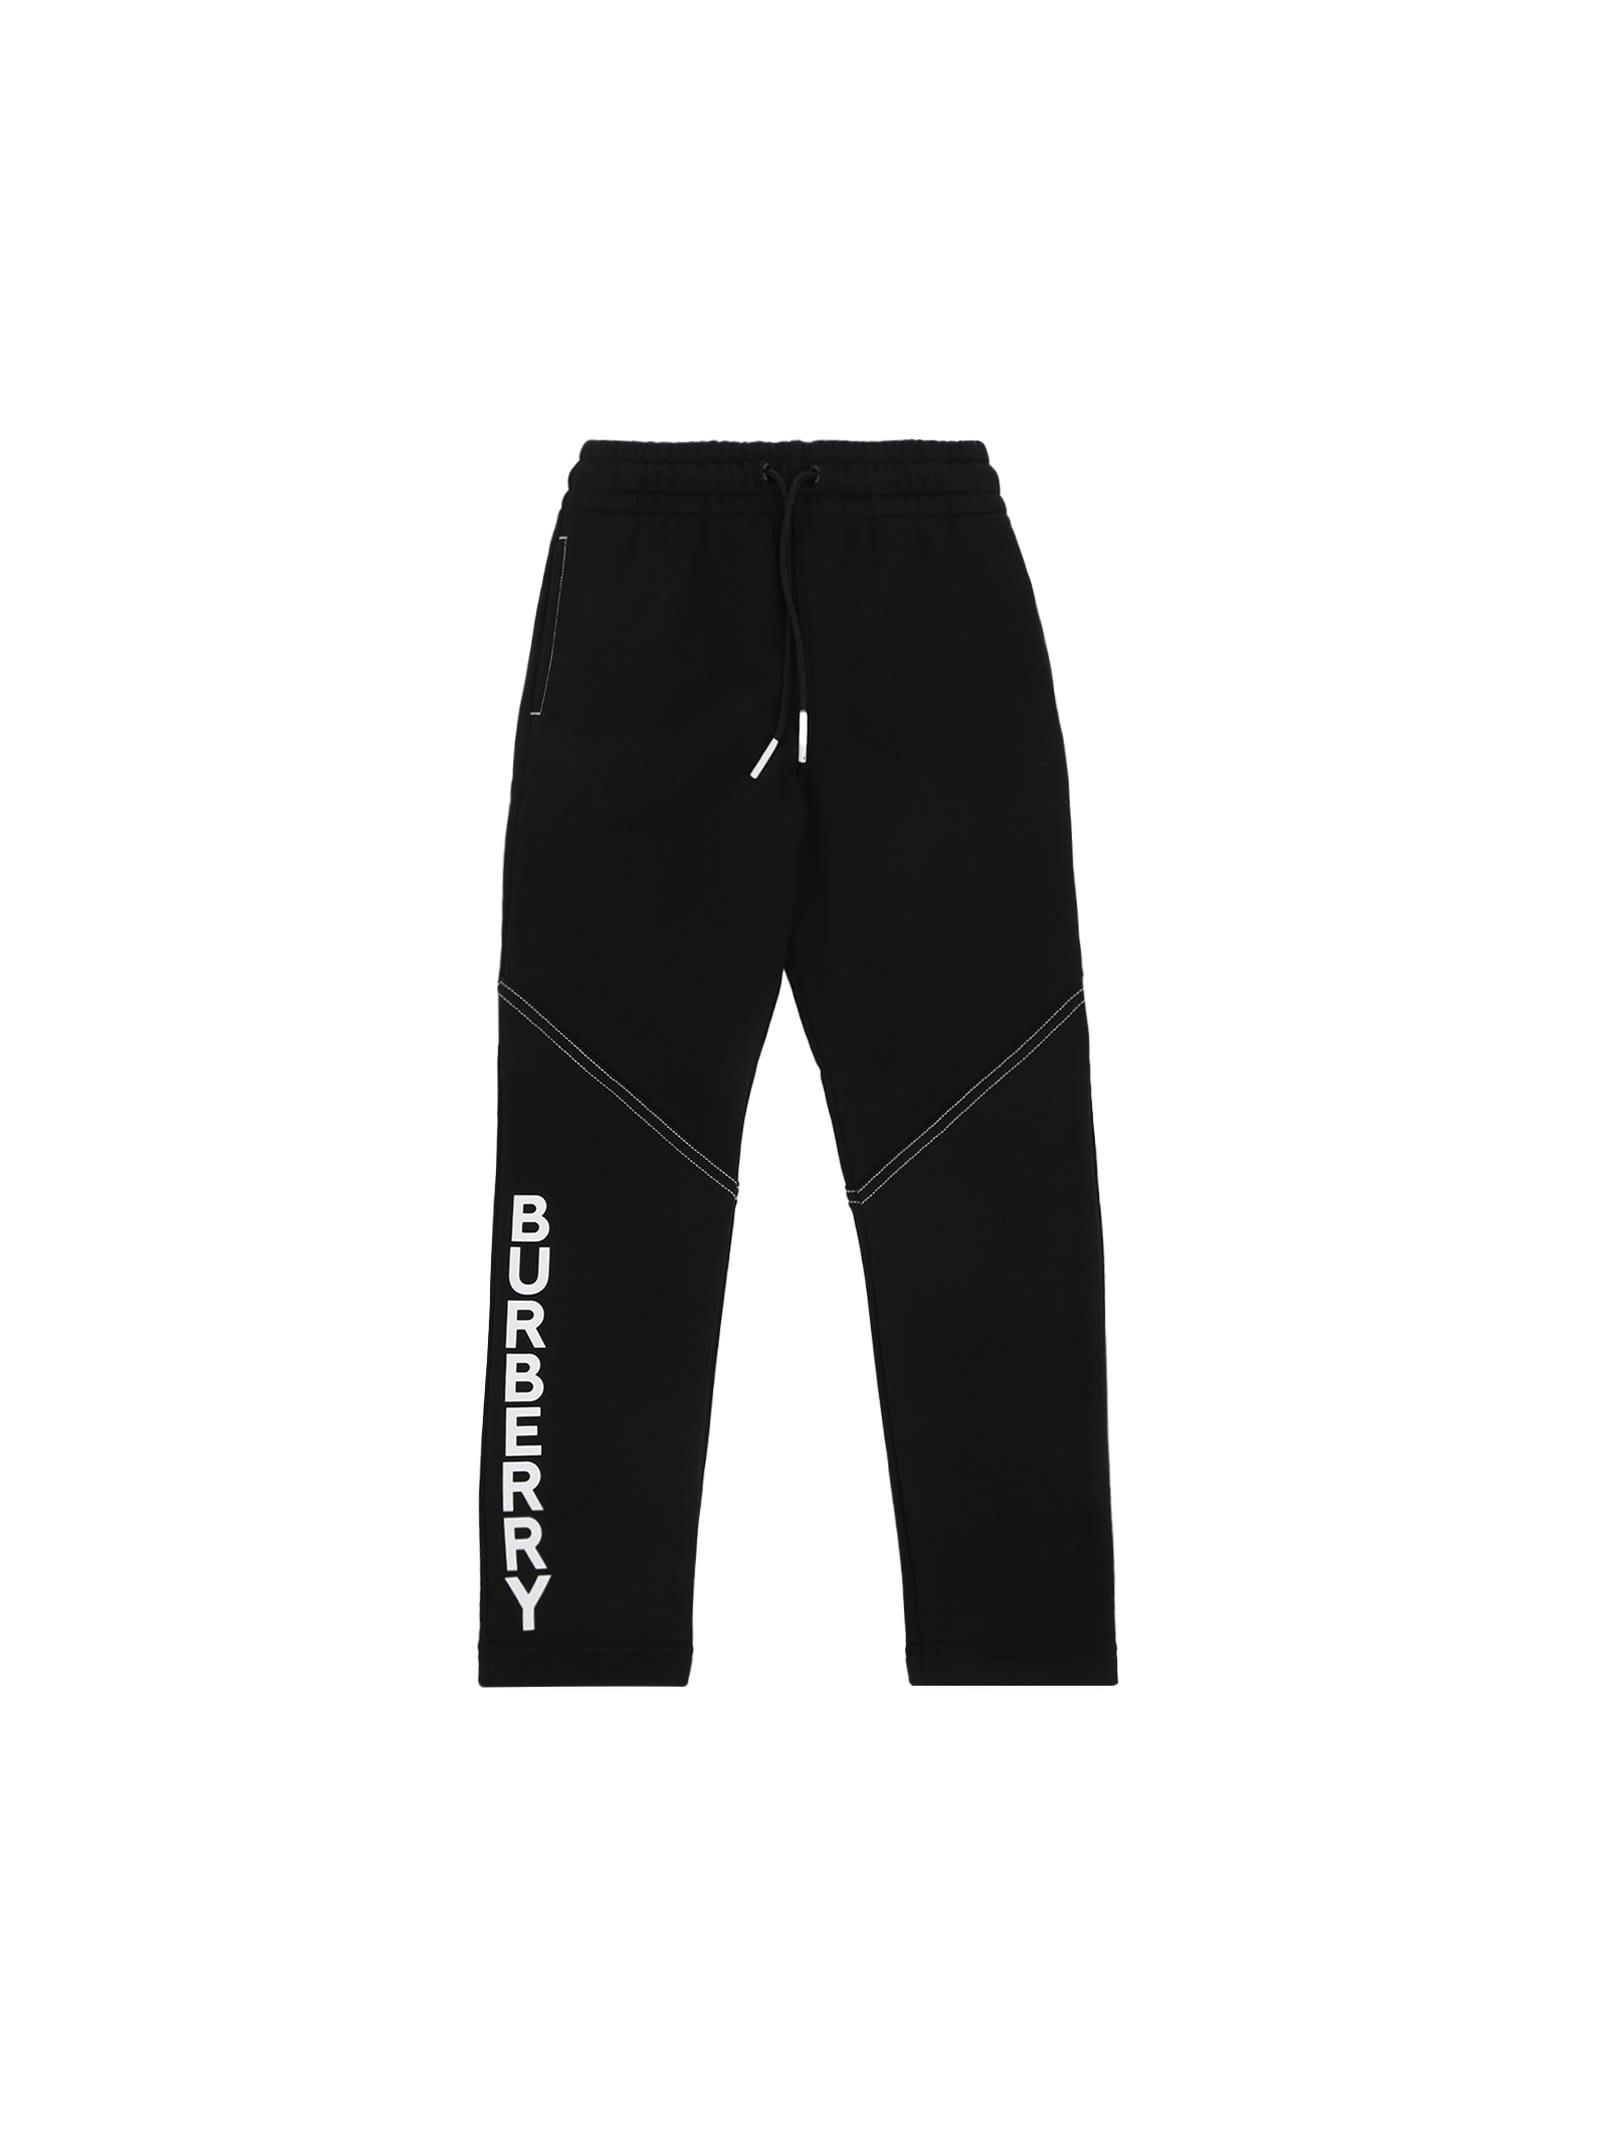 Burberry Kids' Pants In Black